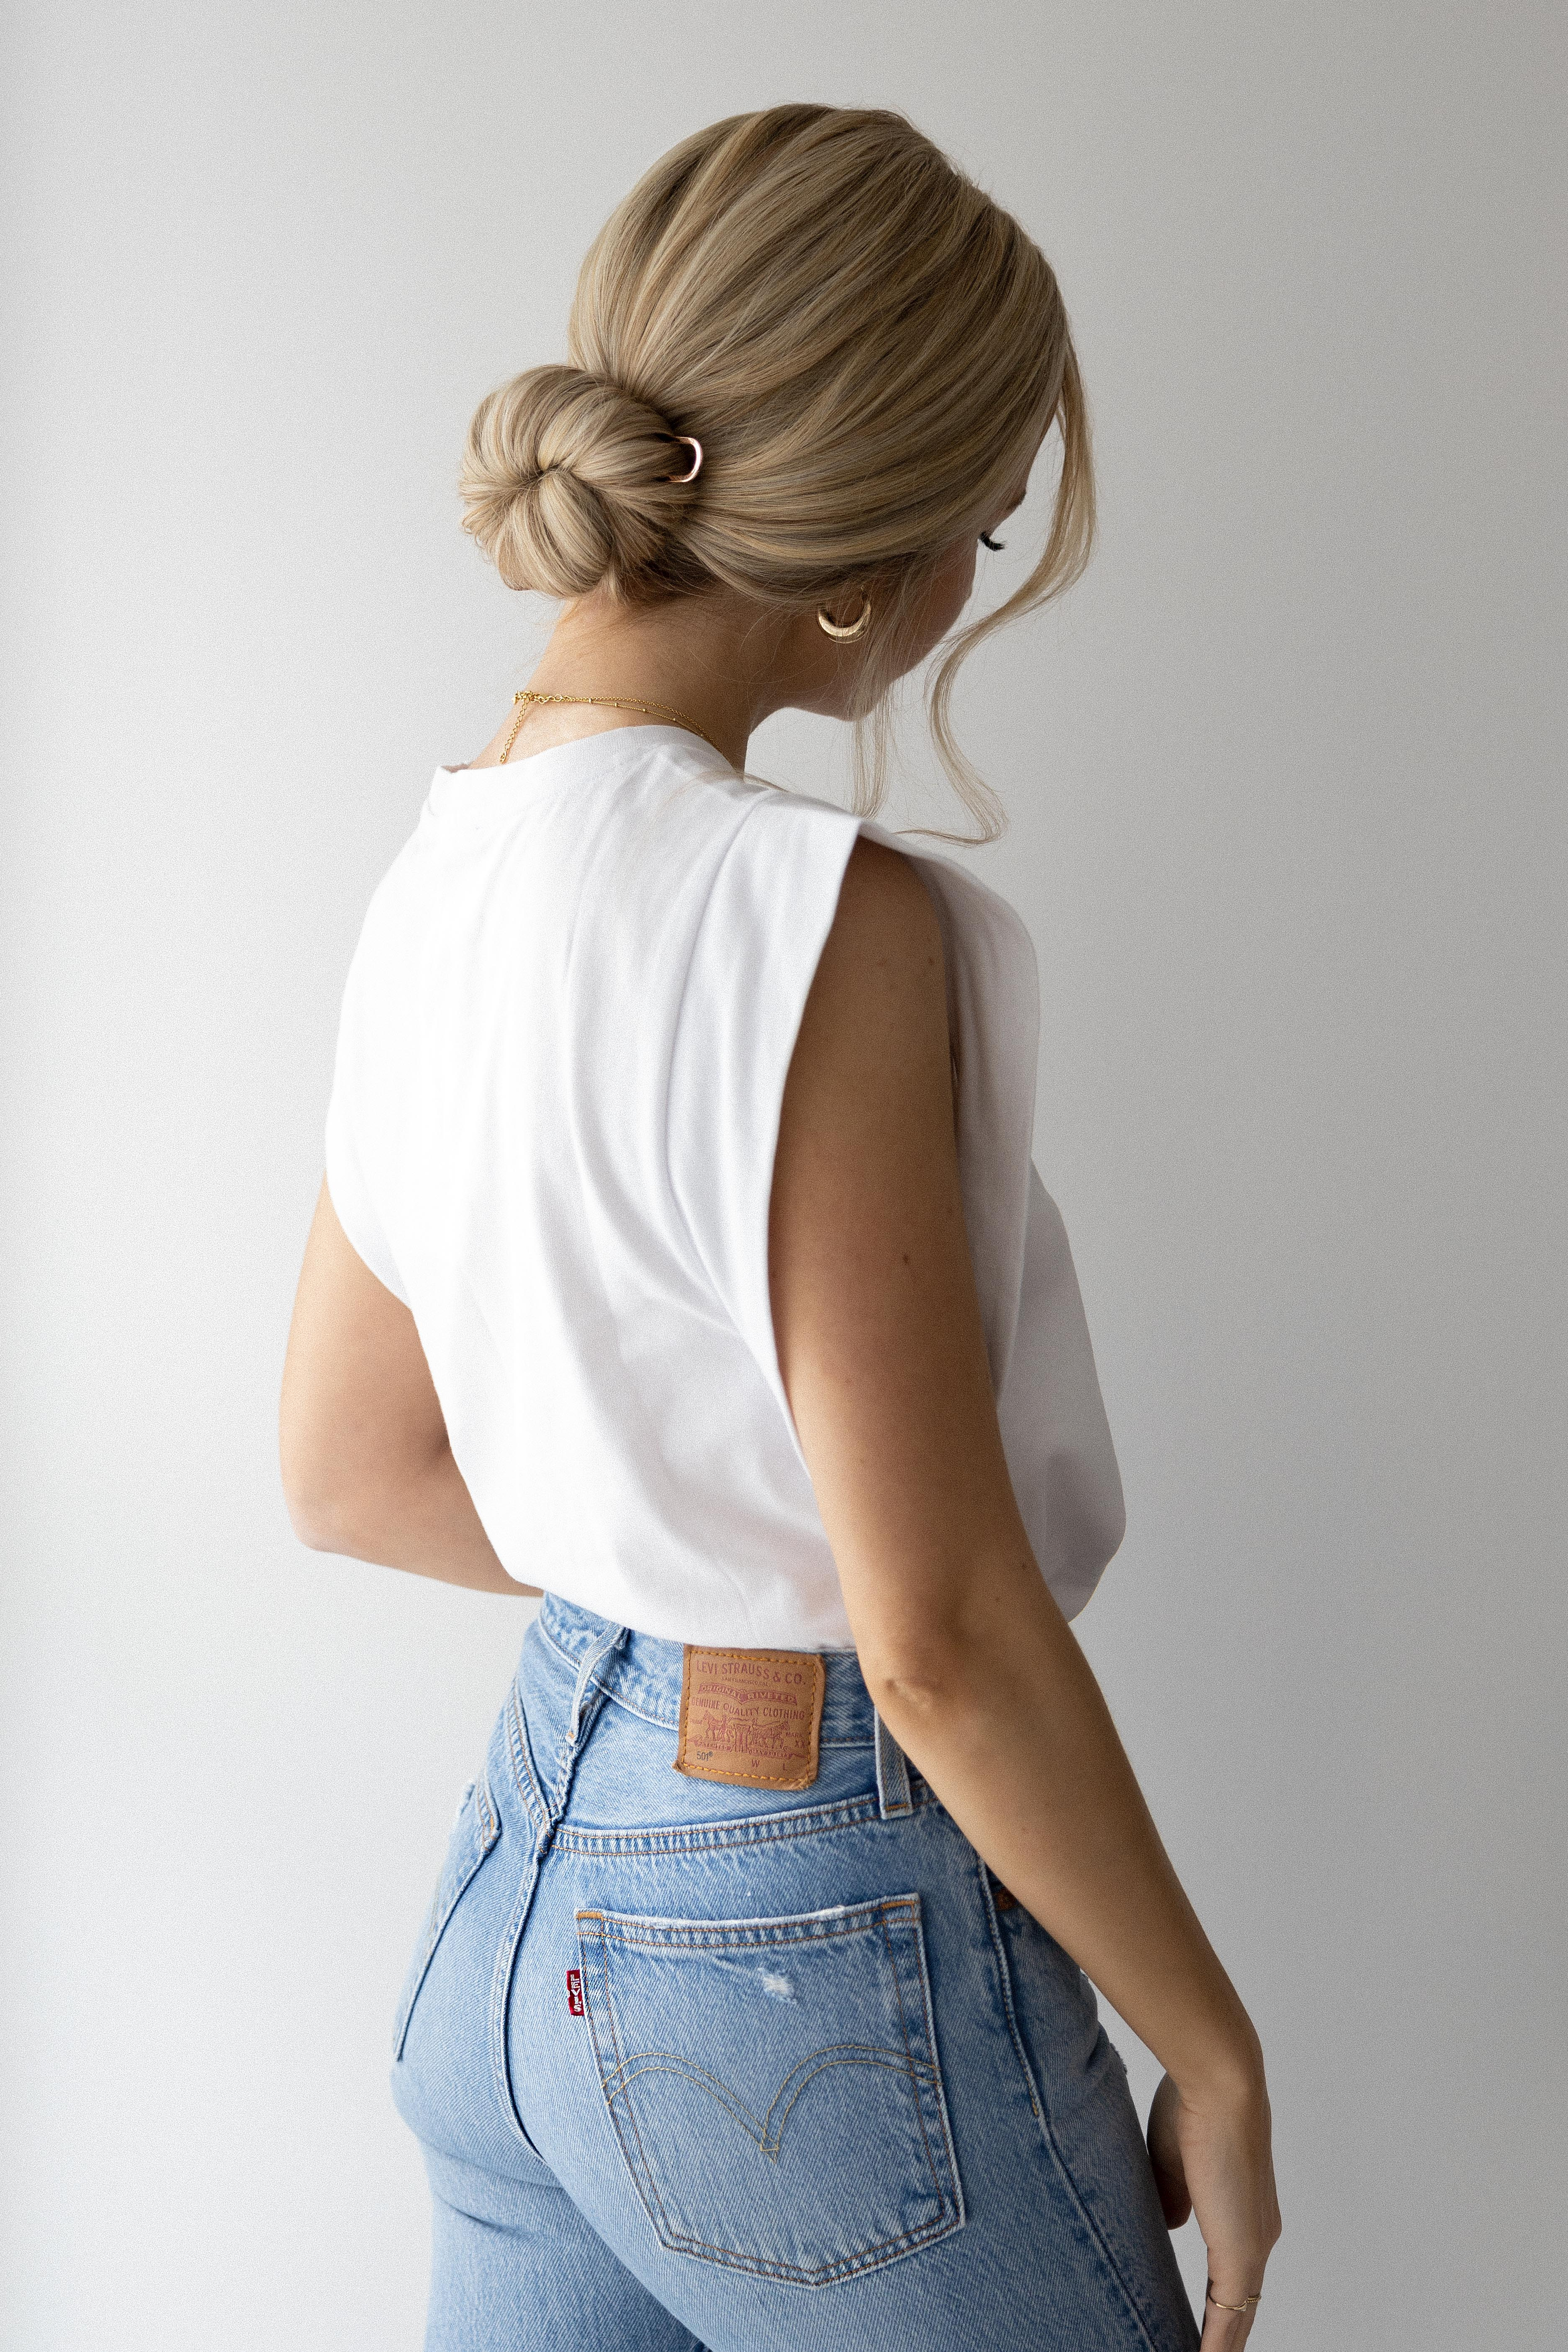 HOW TO: FRENCH PIN BUN Hair Tutorial | www.alexgaboury.com